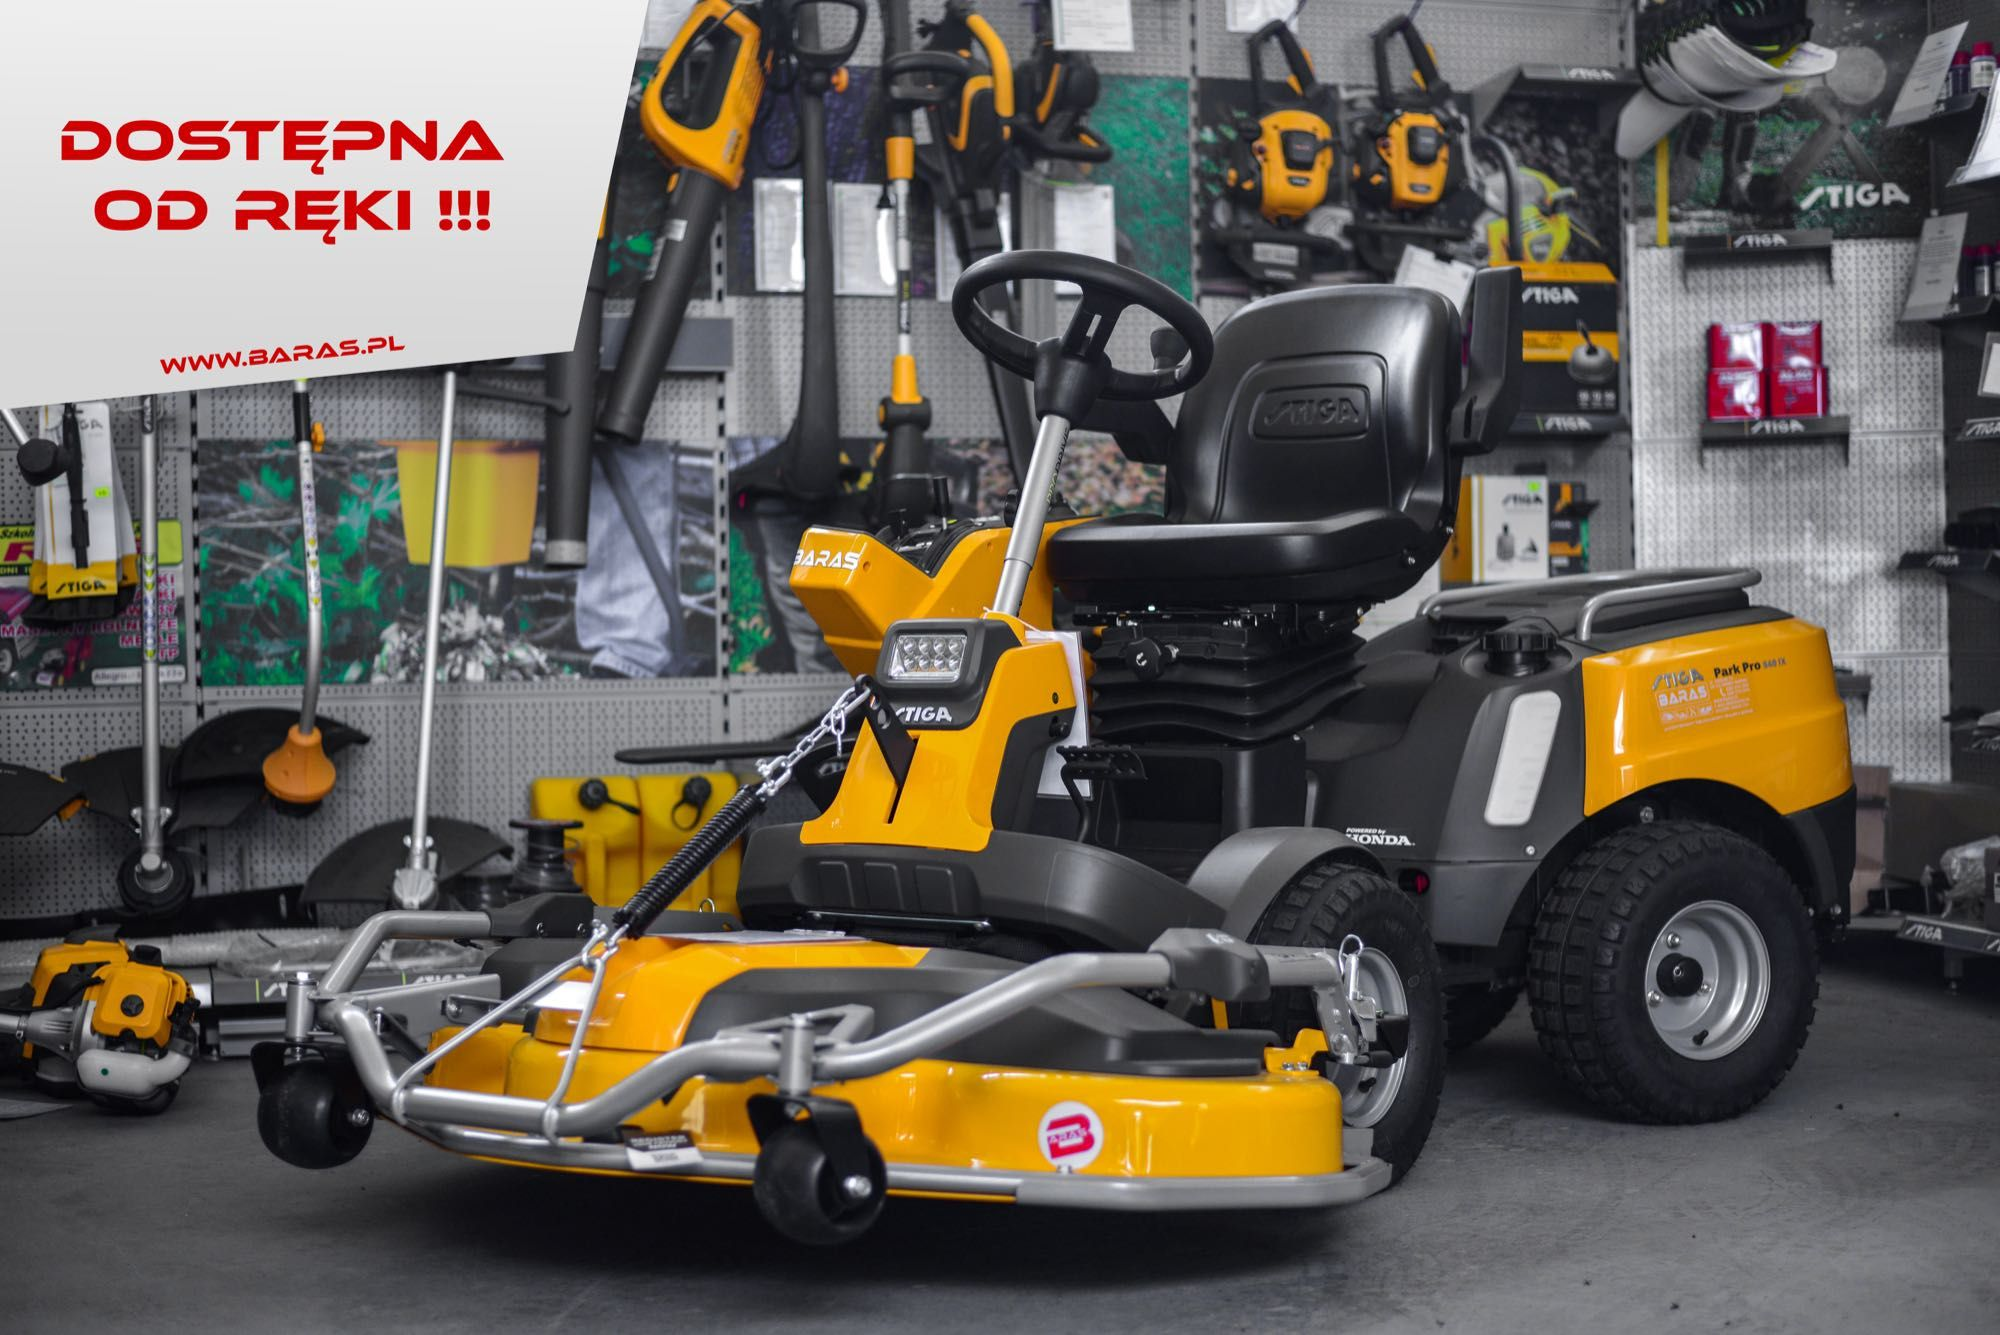 Traktorek ogrodowy Stiga Park Pro 540 IX